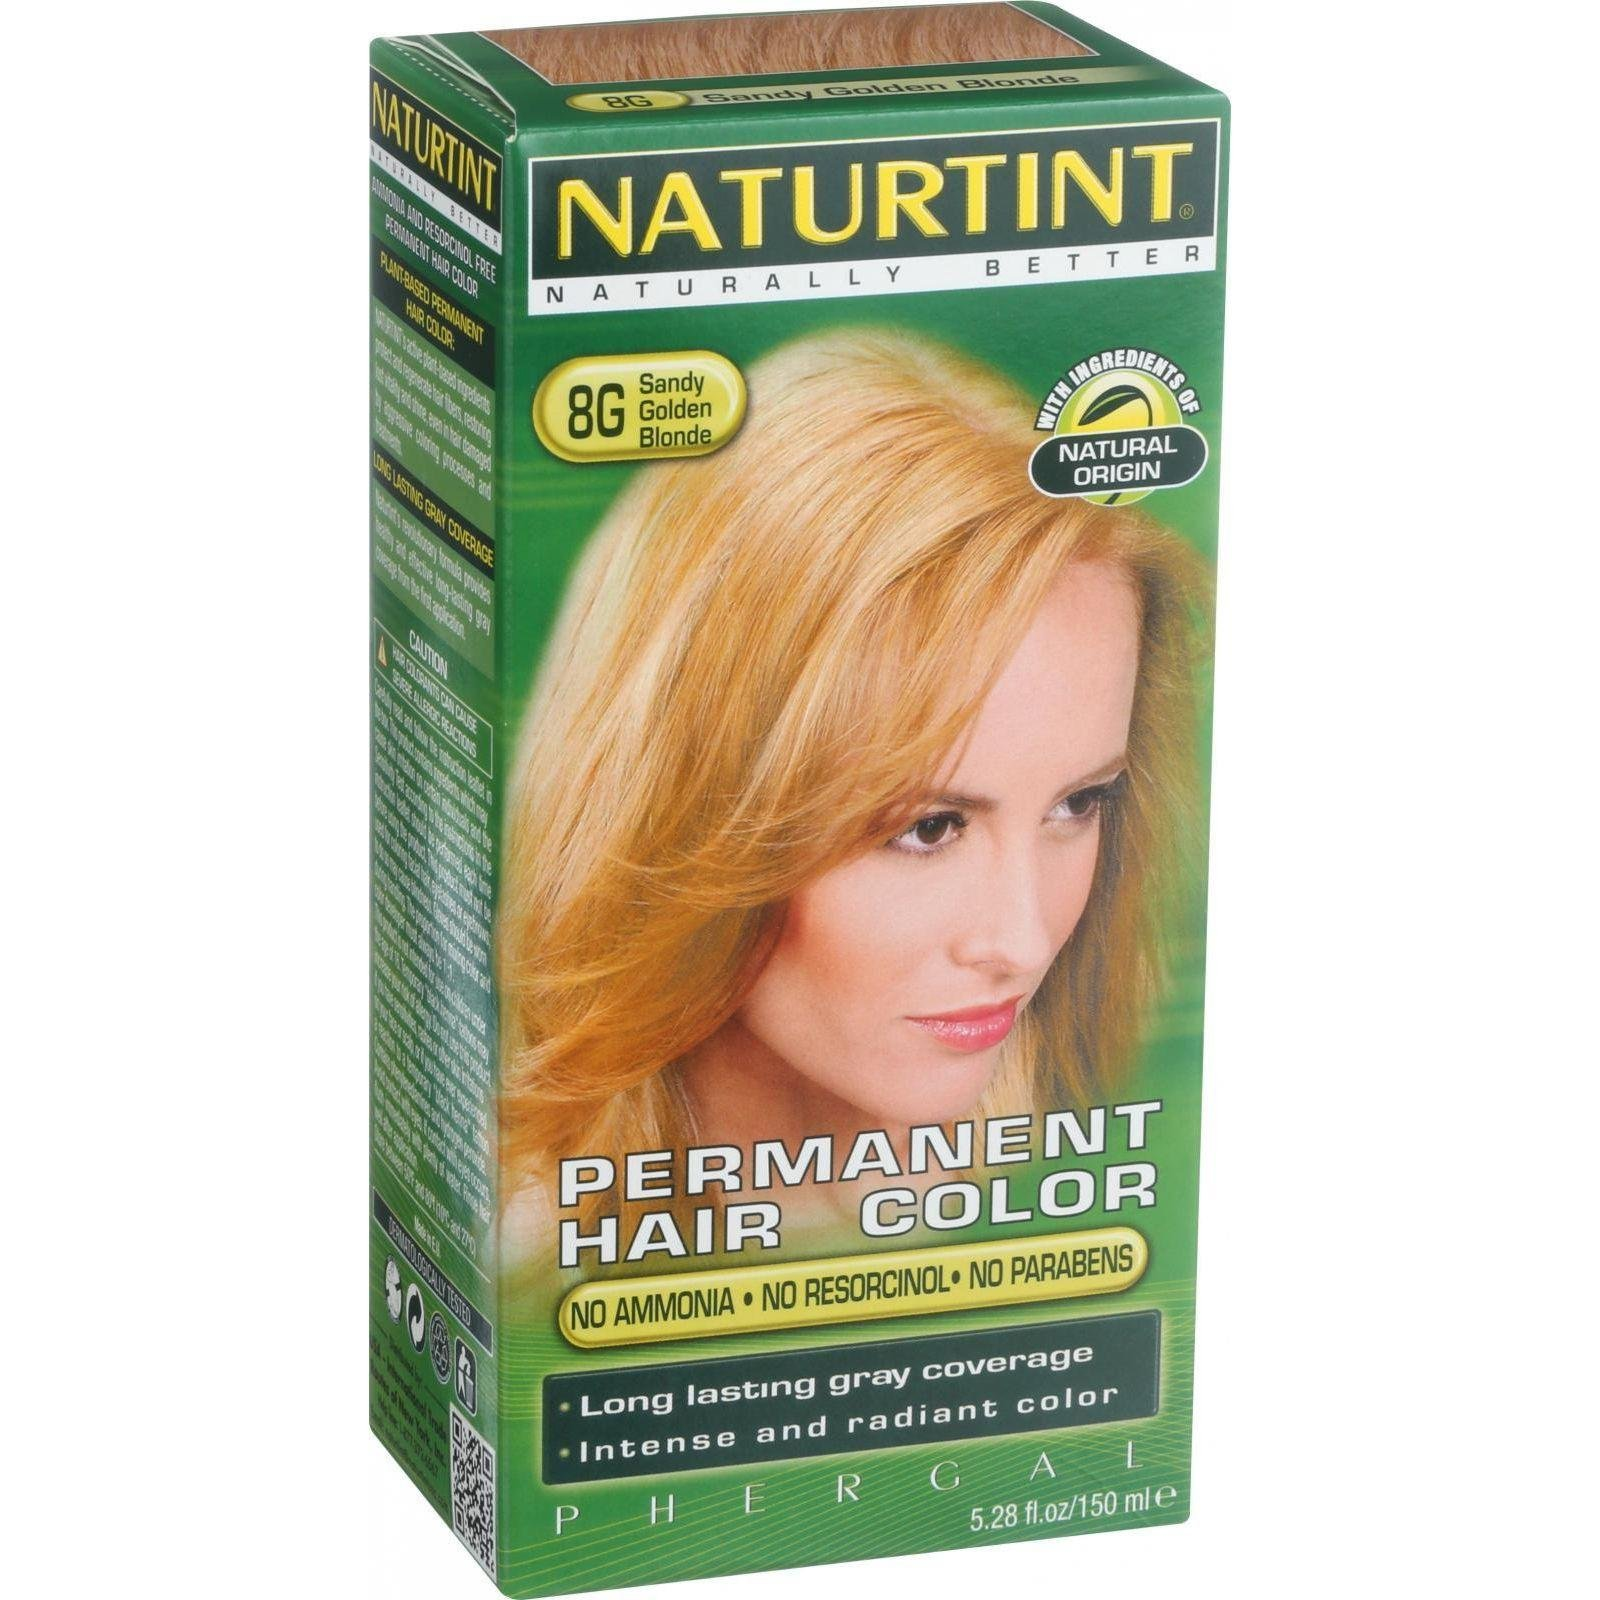 Naturtint Permanent Hair Color - 8G Sandy Golden Blonde, 5.28 fl oz (6-pack) by Naturtint by Naturtint